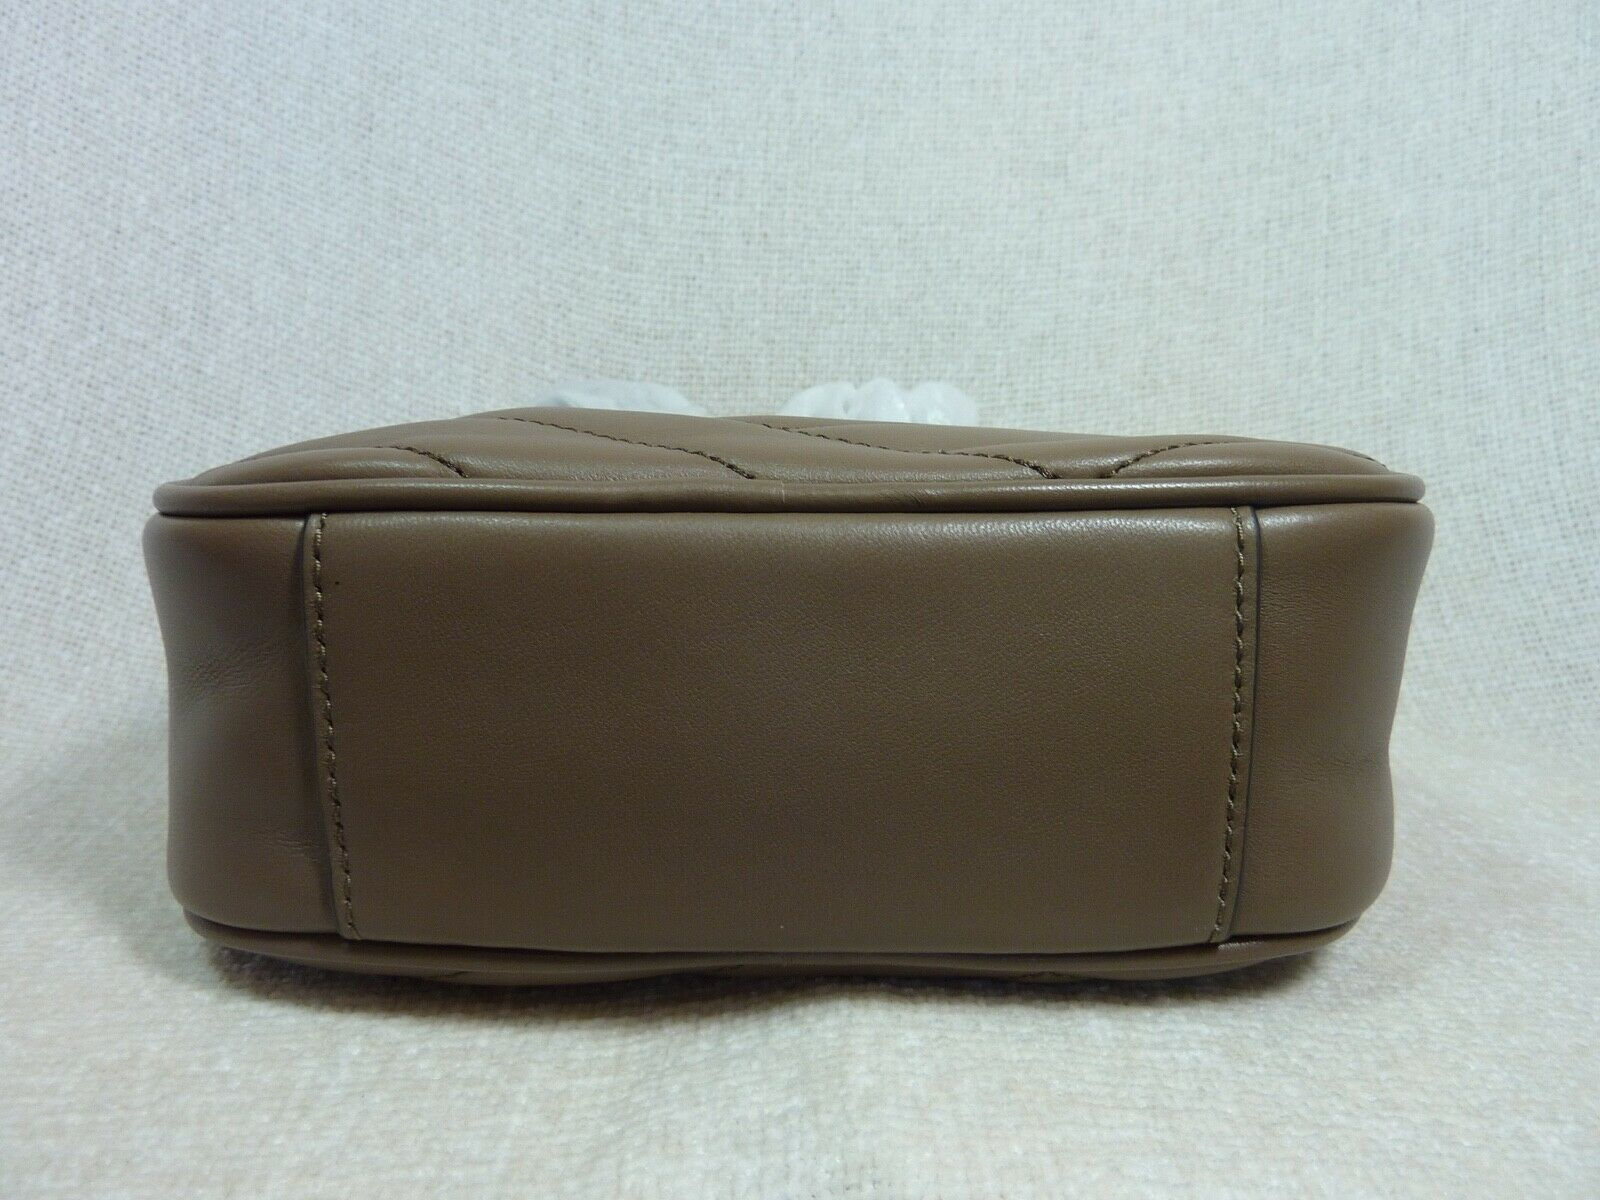 NWT Tory Burch Classic Taupe Kira Chevron Small Camera Bag $358 image 5